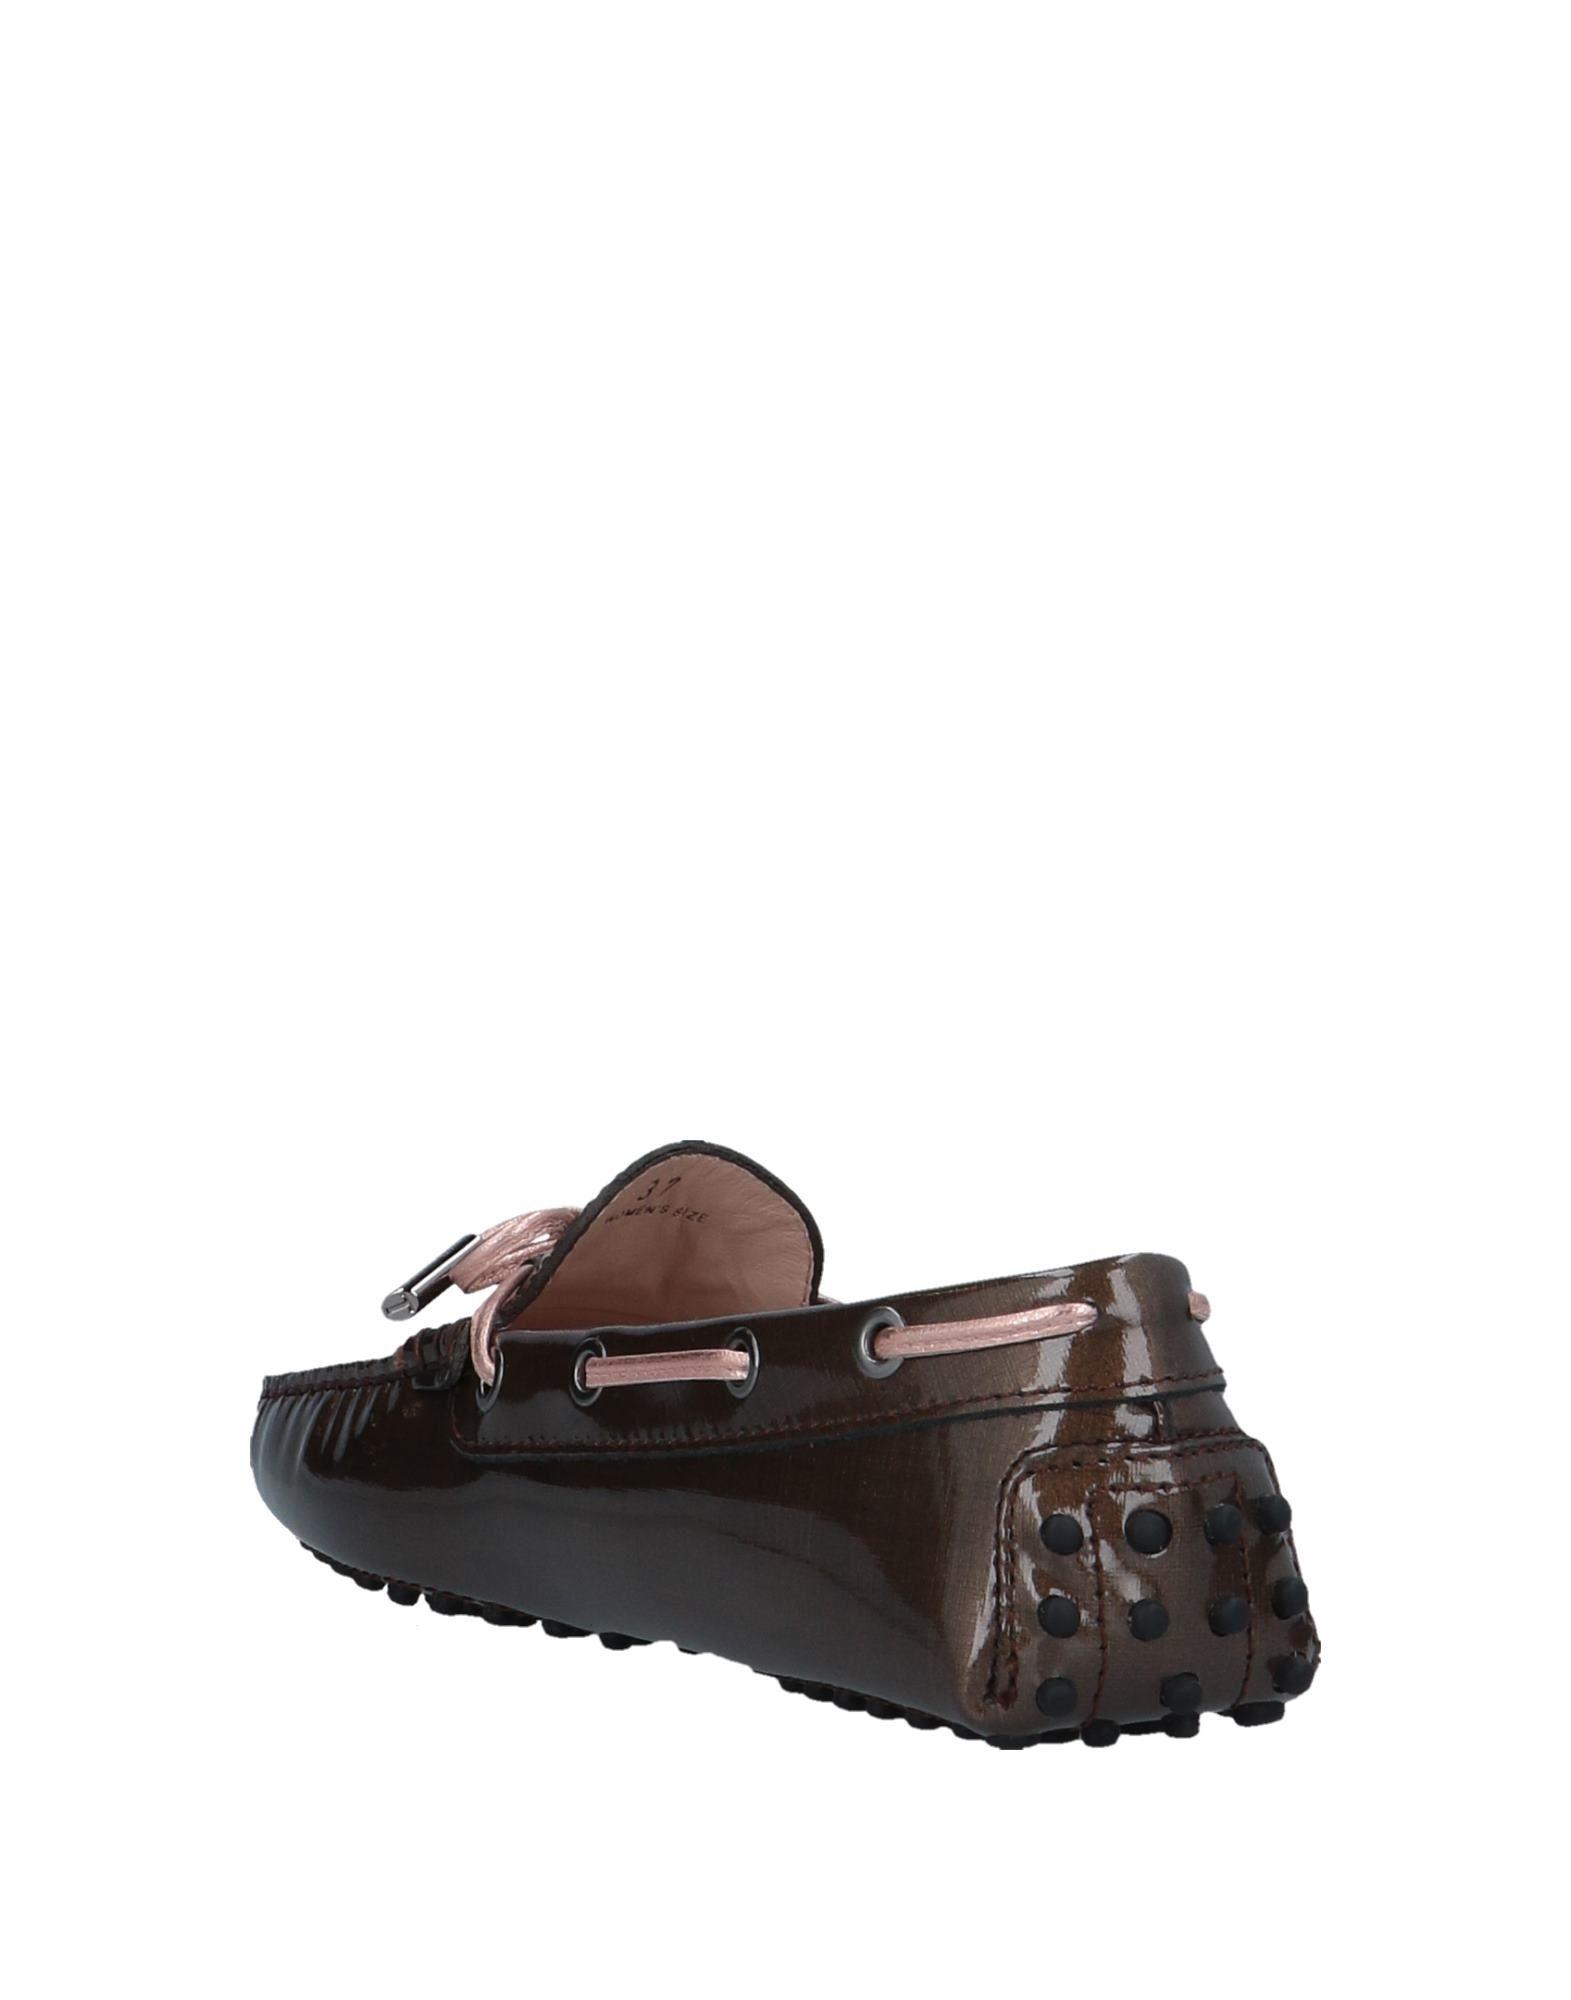 Rabatt Schuhe 11542810CK Tod's Mokassins Damen  11542810CK Schuhe 9f52fa